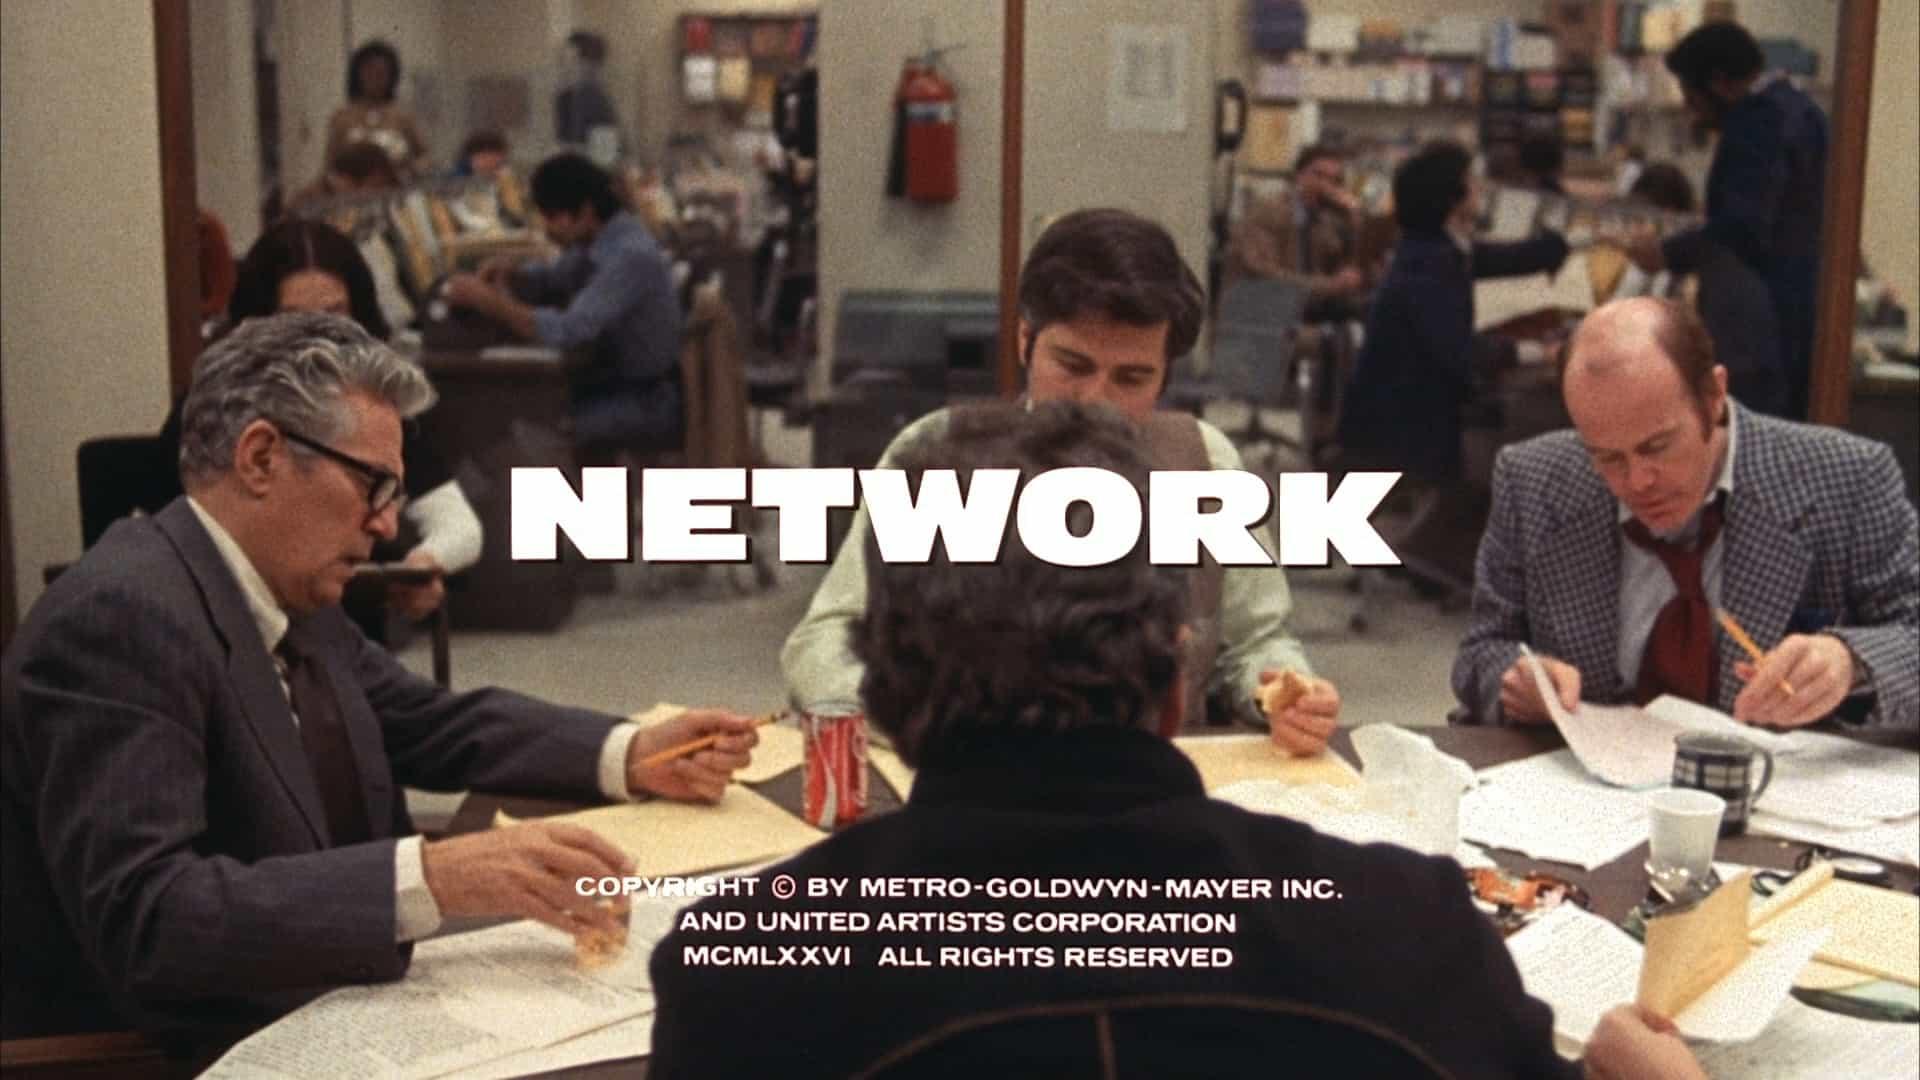 network-movie-title